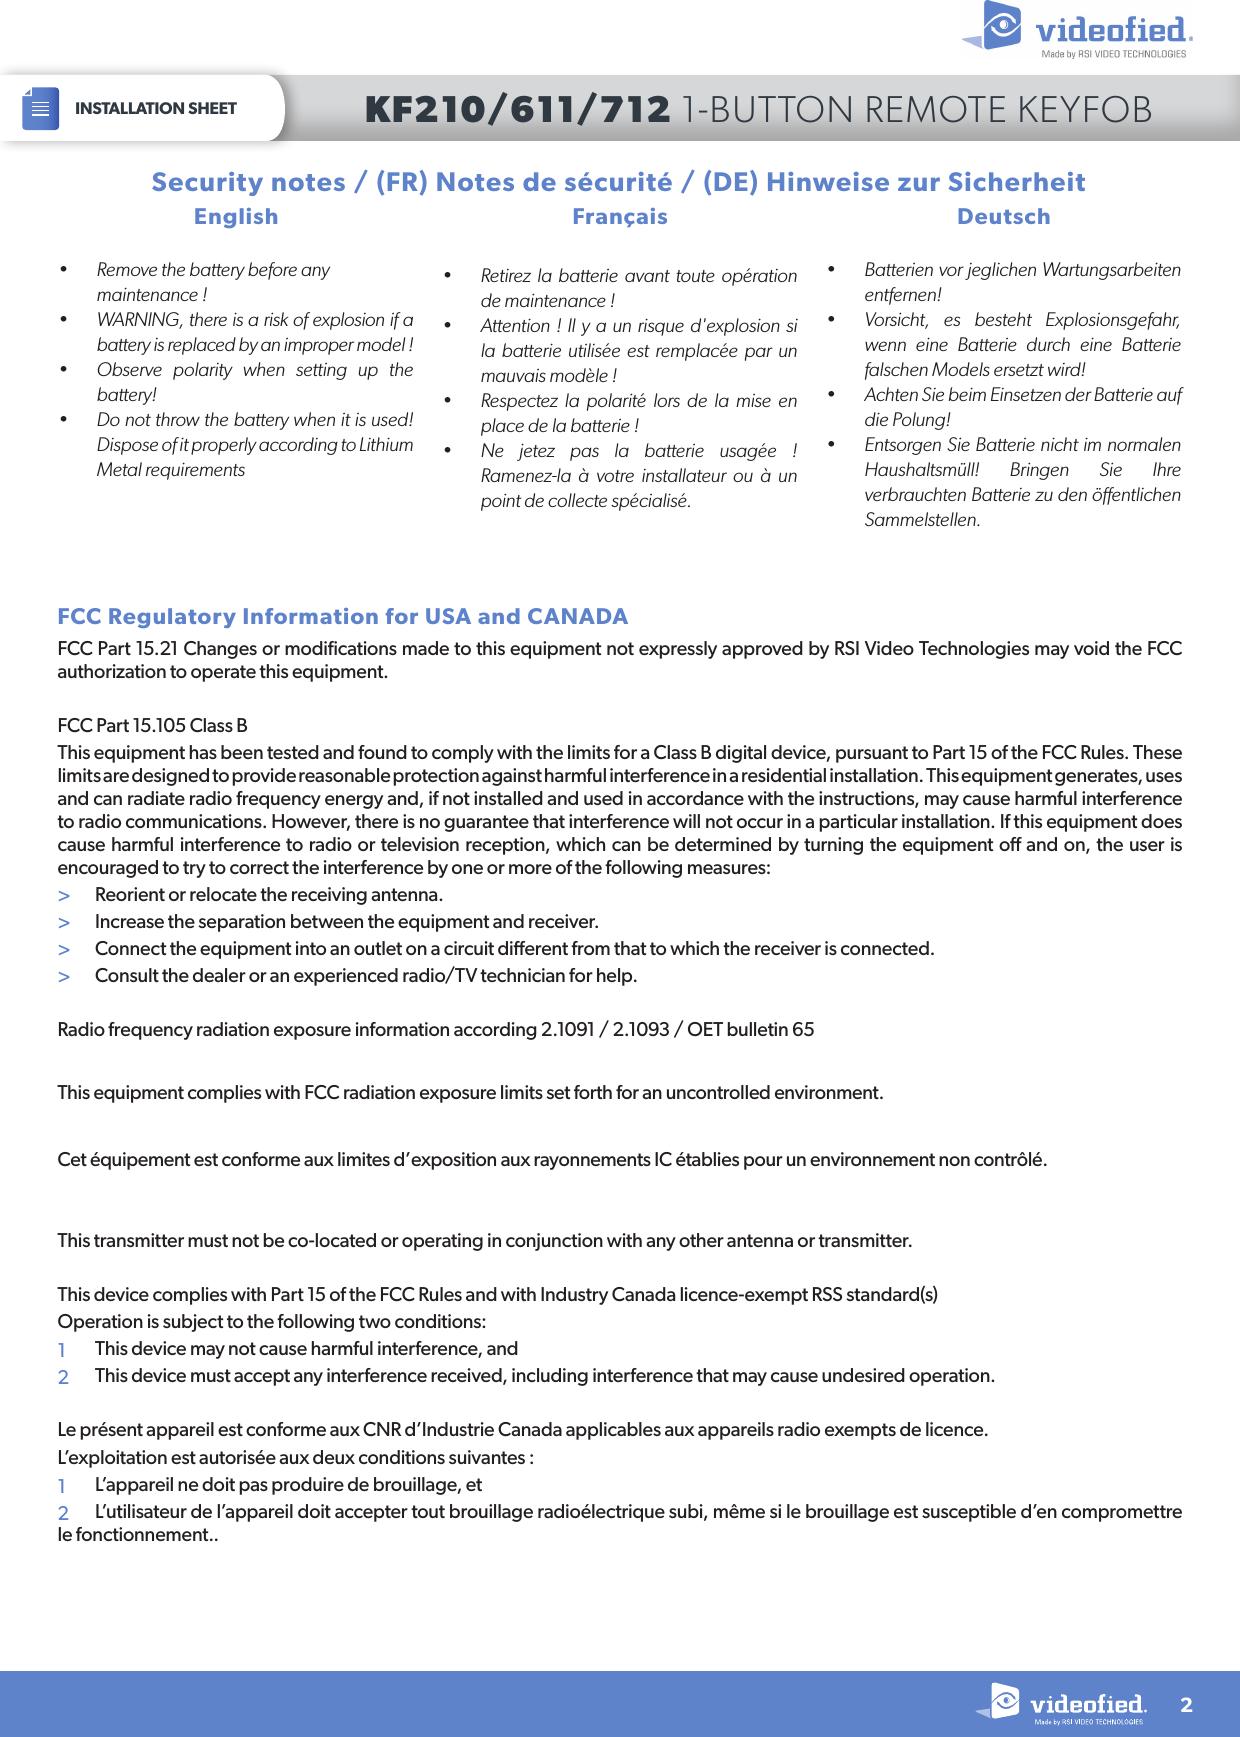 RSI VIDEOTECHNOLOGIES KF00 Keyfob User Manual Manual kf611